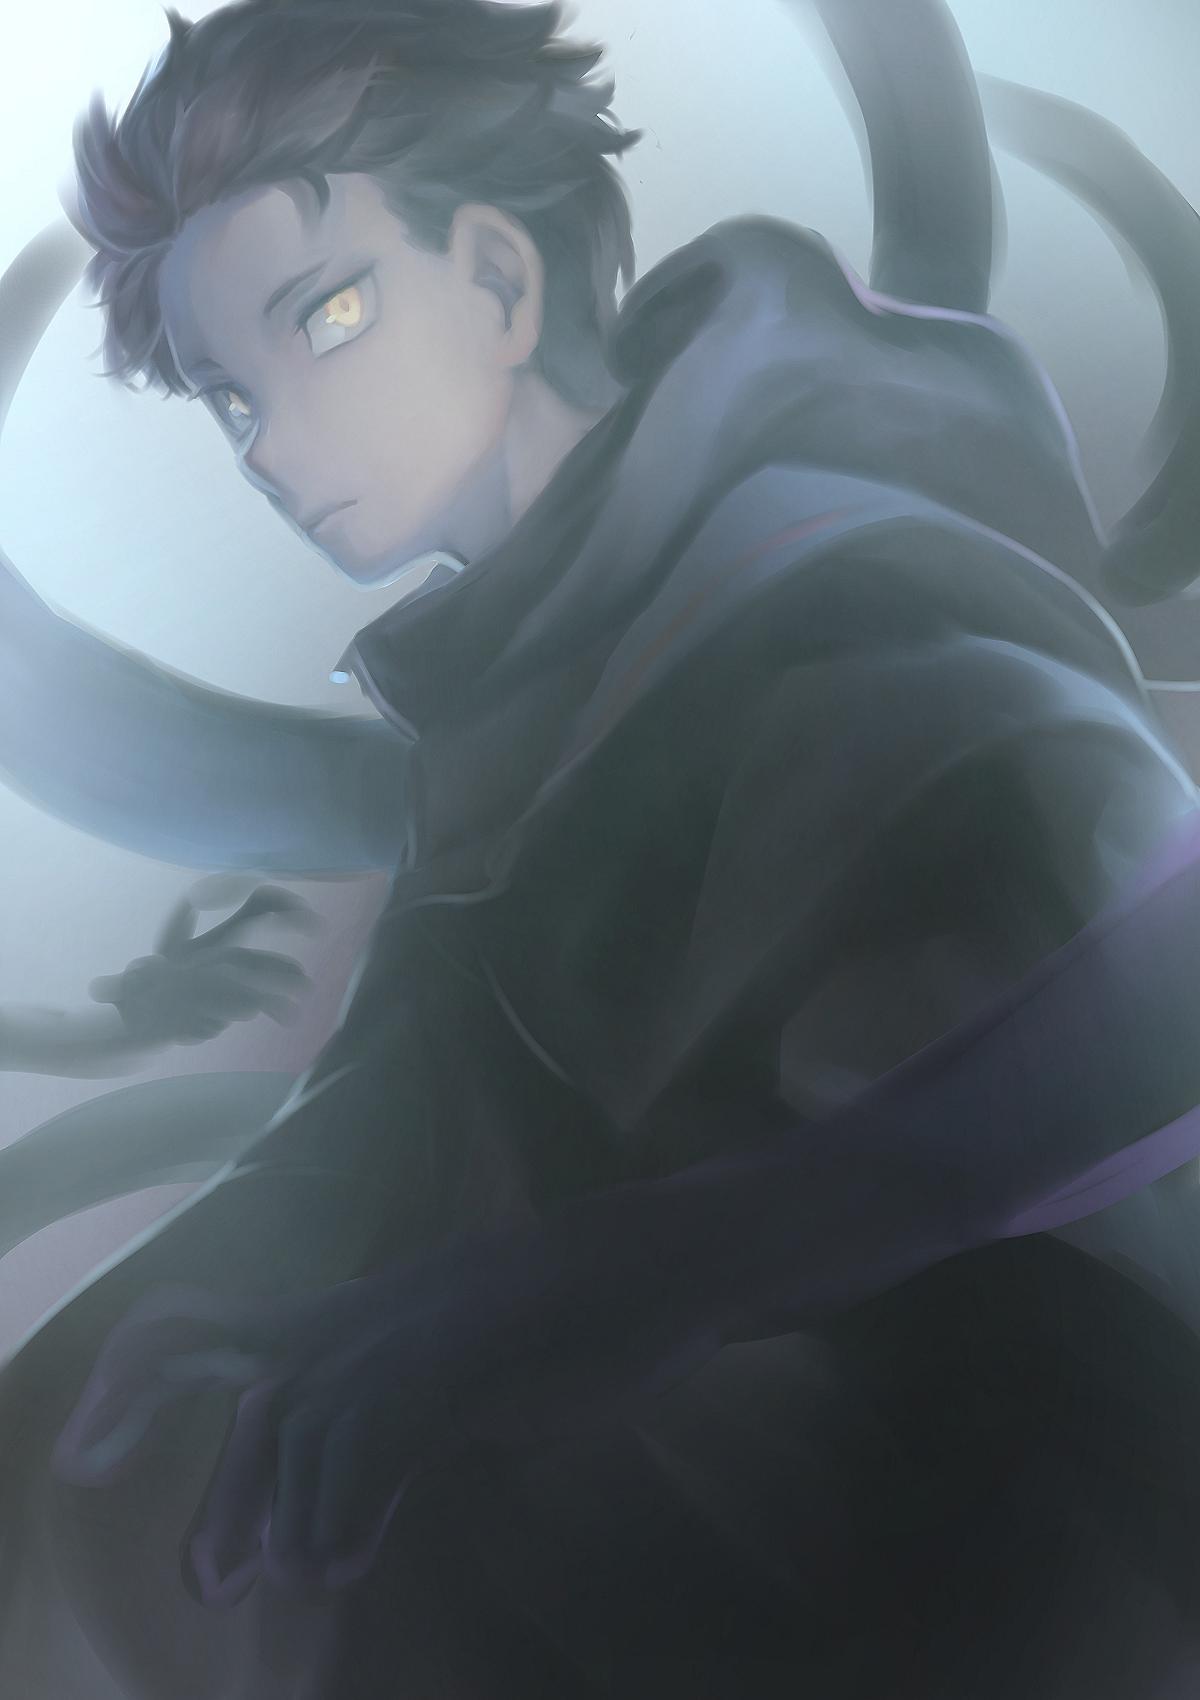 Get Good Looking Anime Wallpaper Iphone Re Zero In Anime Subaru Anime Images